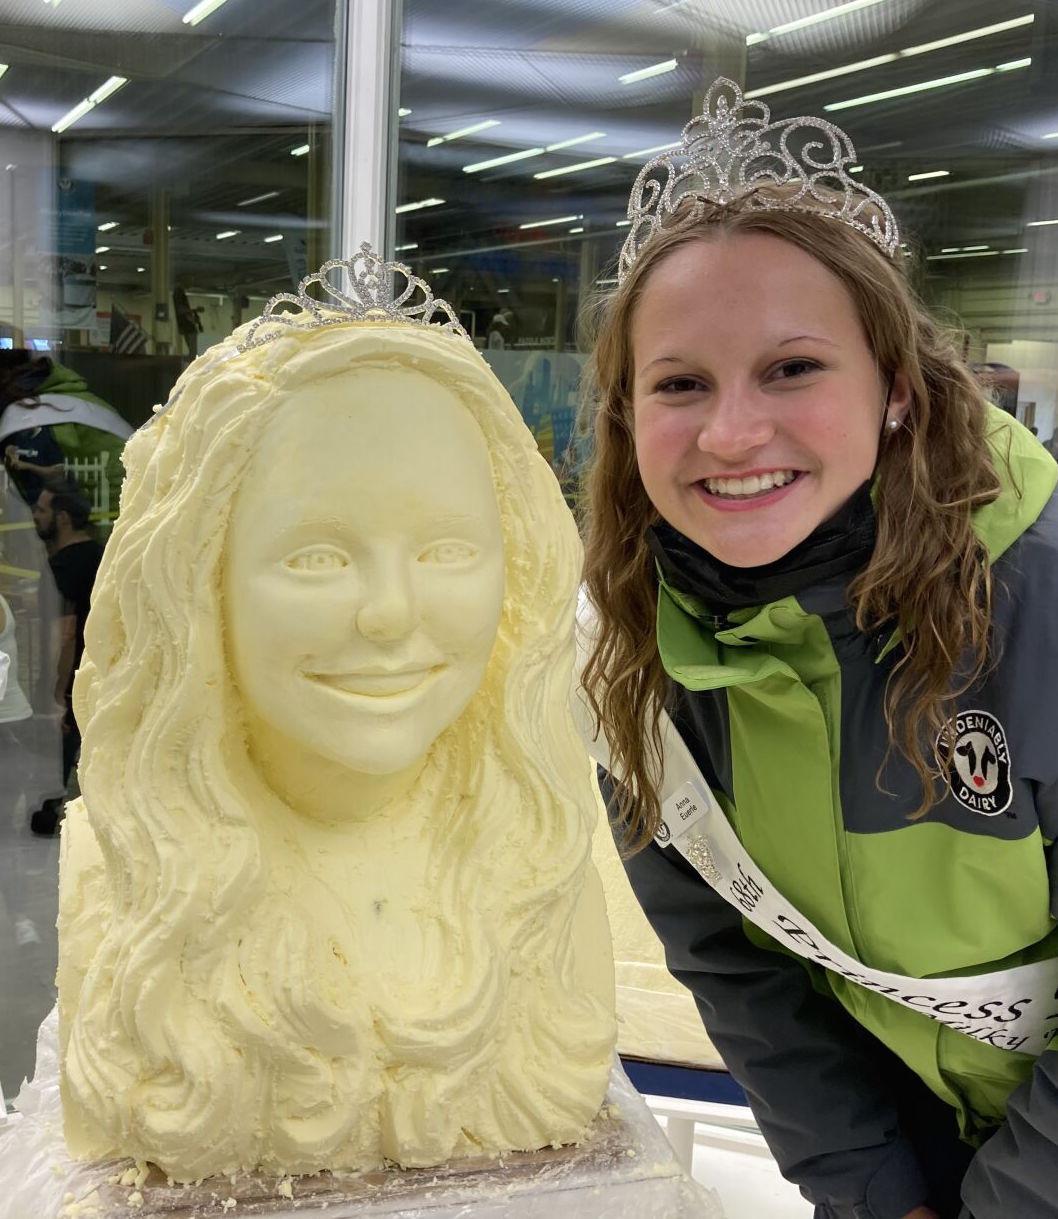 Princess Kay Euerle